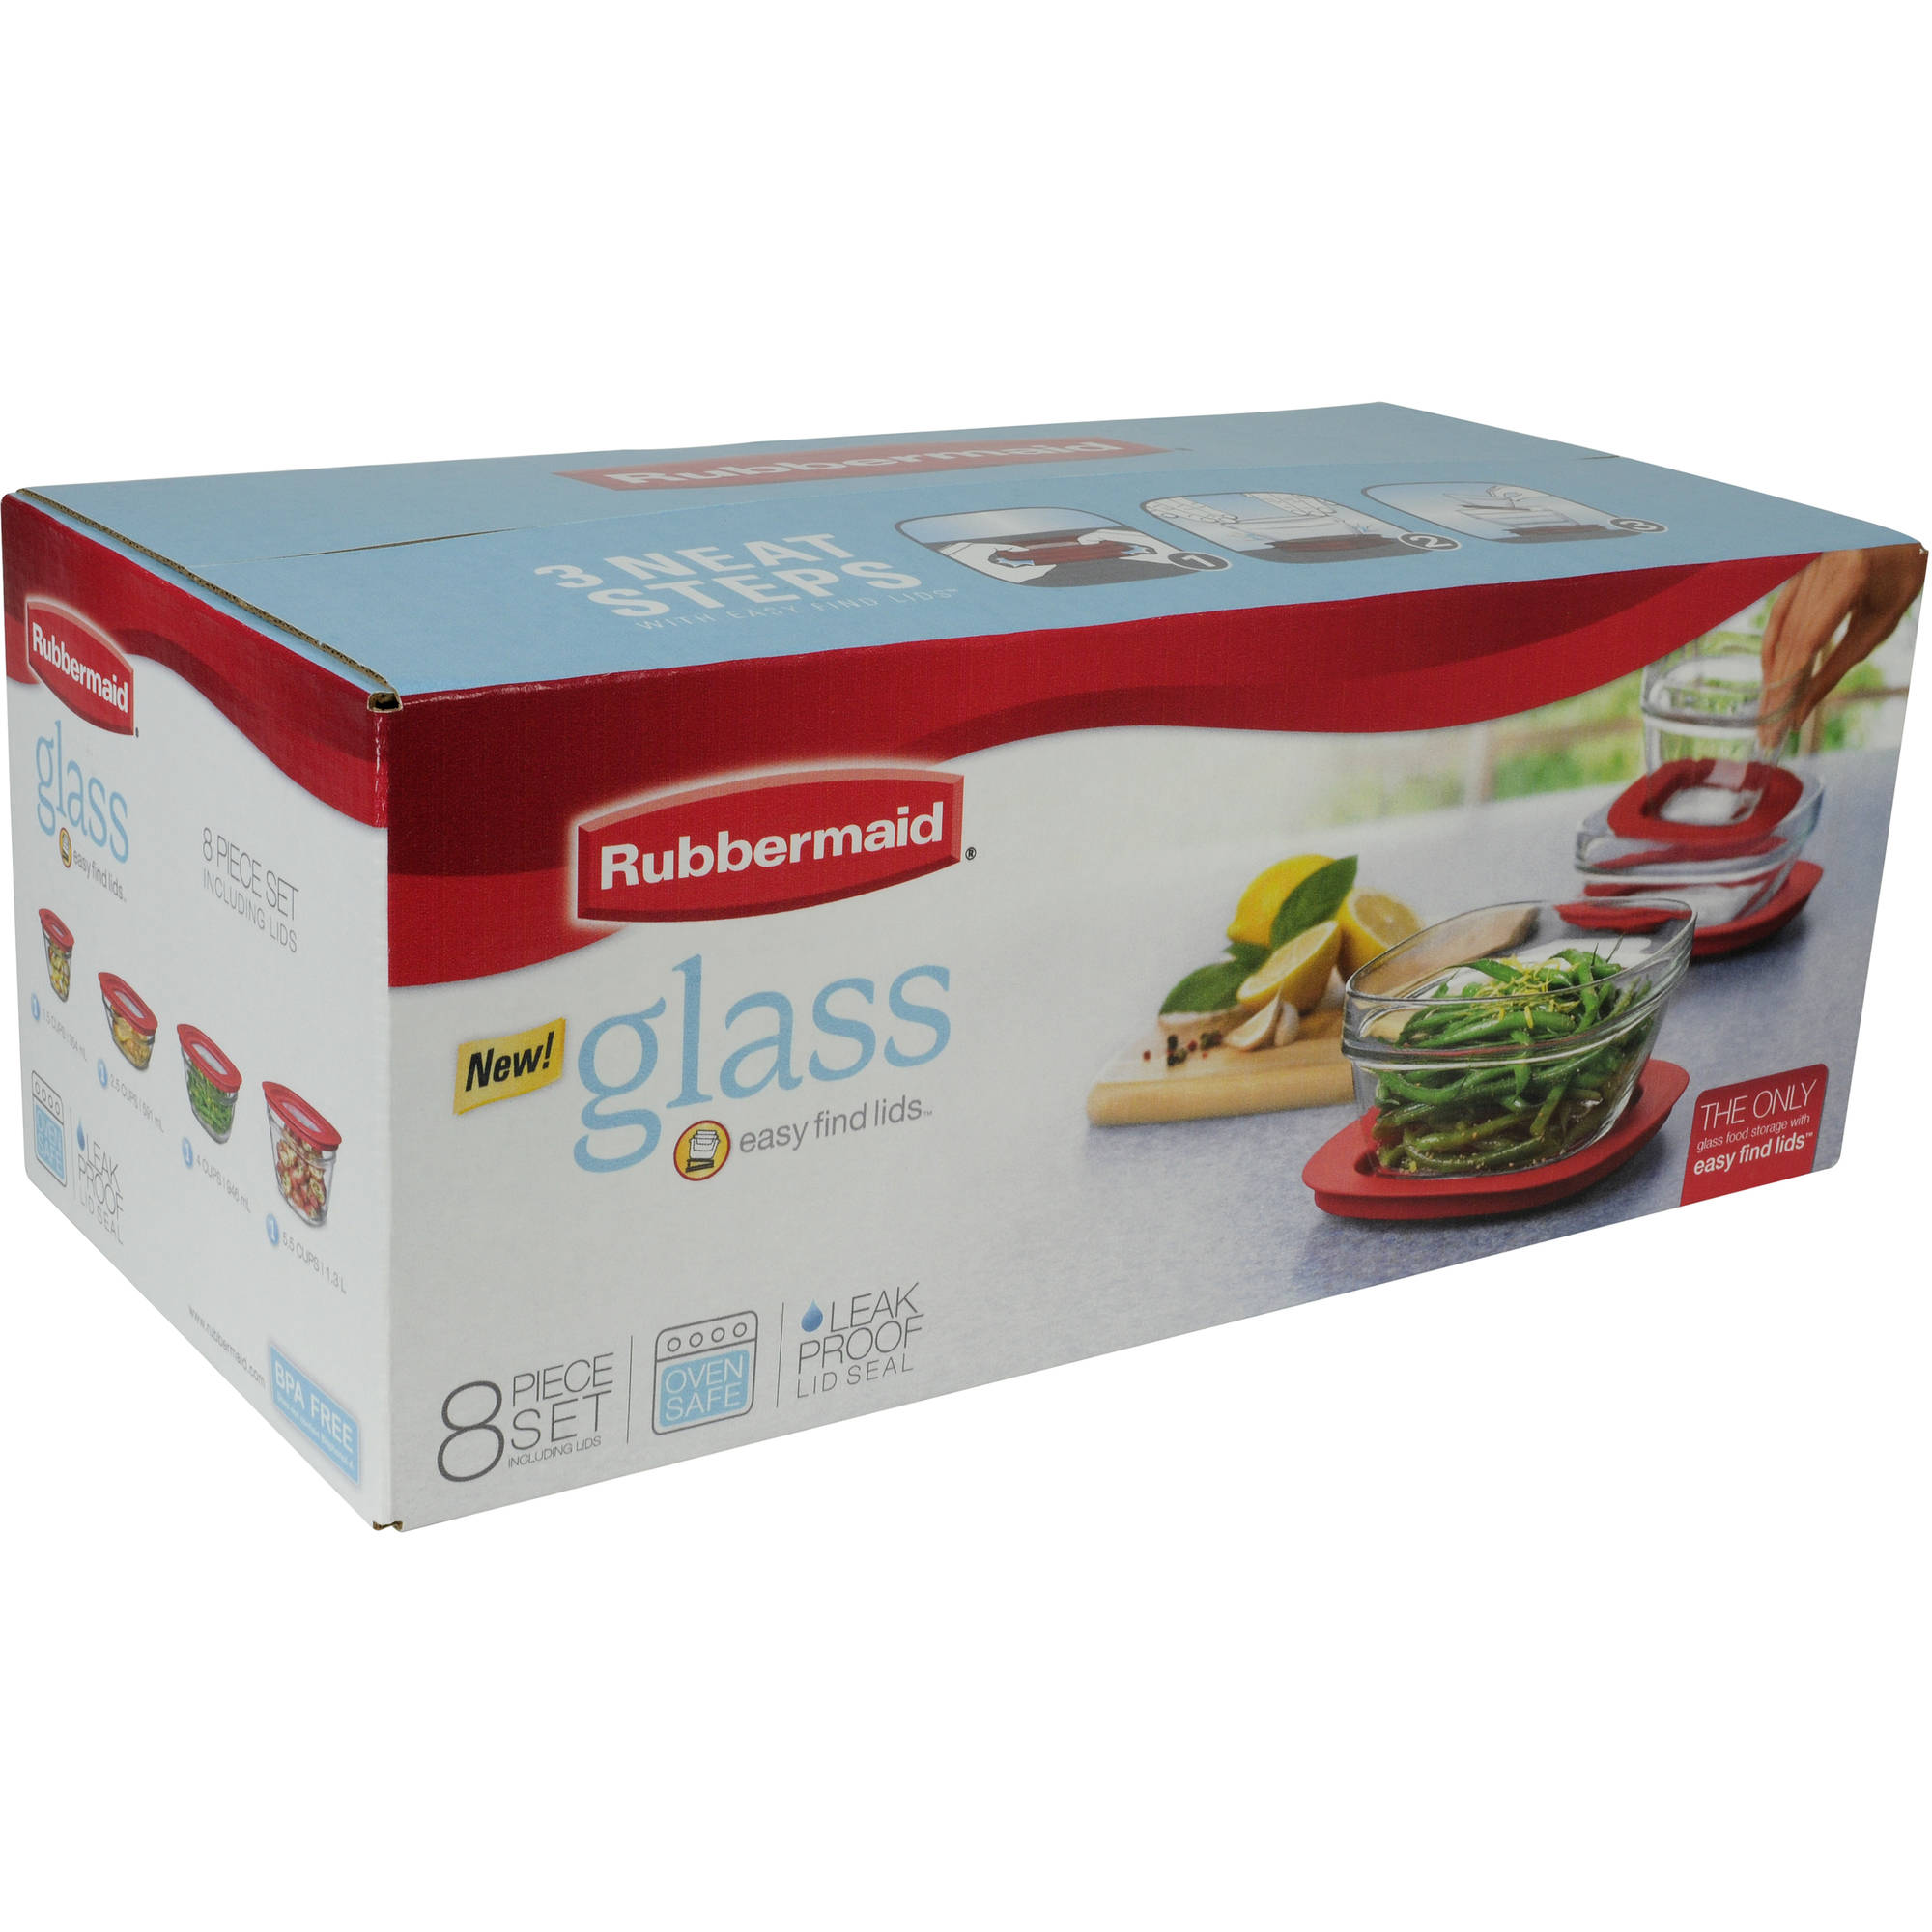 Rubbermaid 8-Piece Glass Food Storage Set